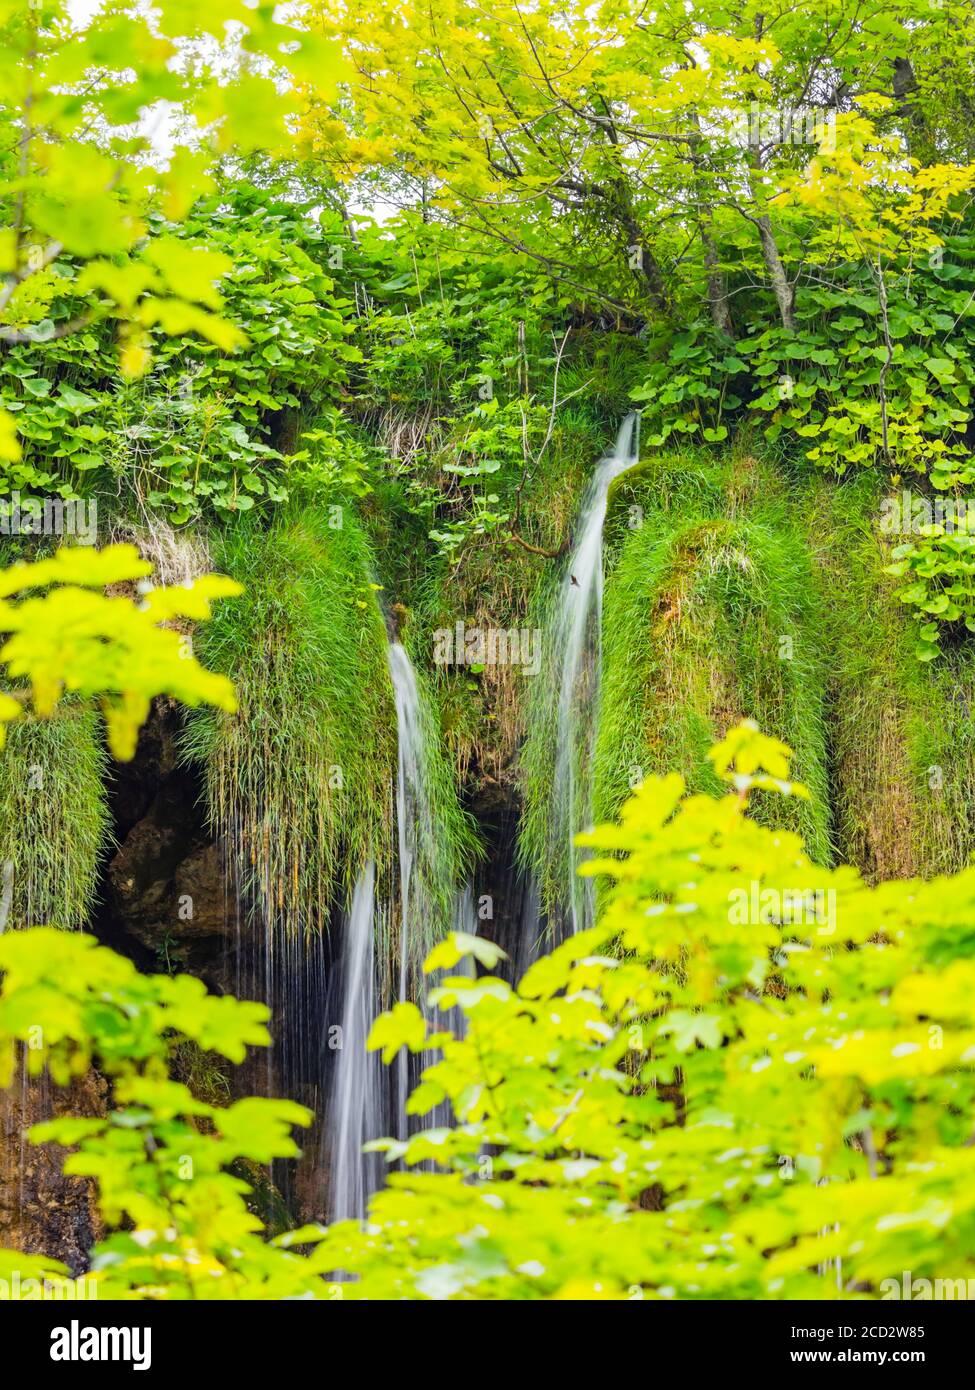 National park Plitvice lakes in Croatia Europe water flowing waterflow waterfall scenic scenery Stock Photo